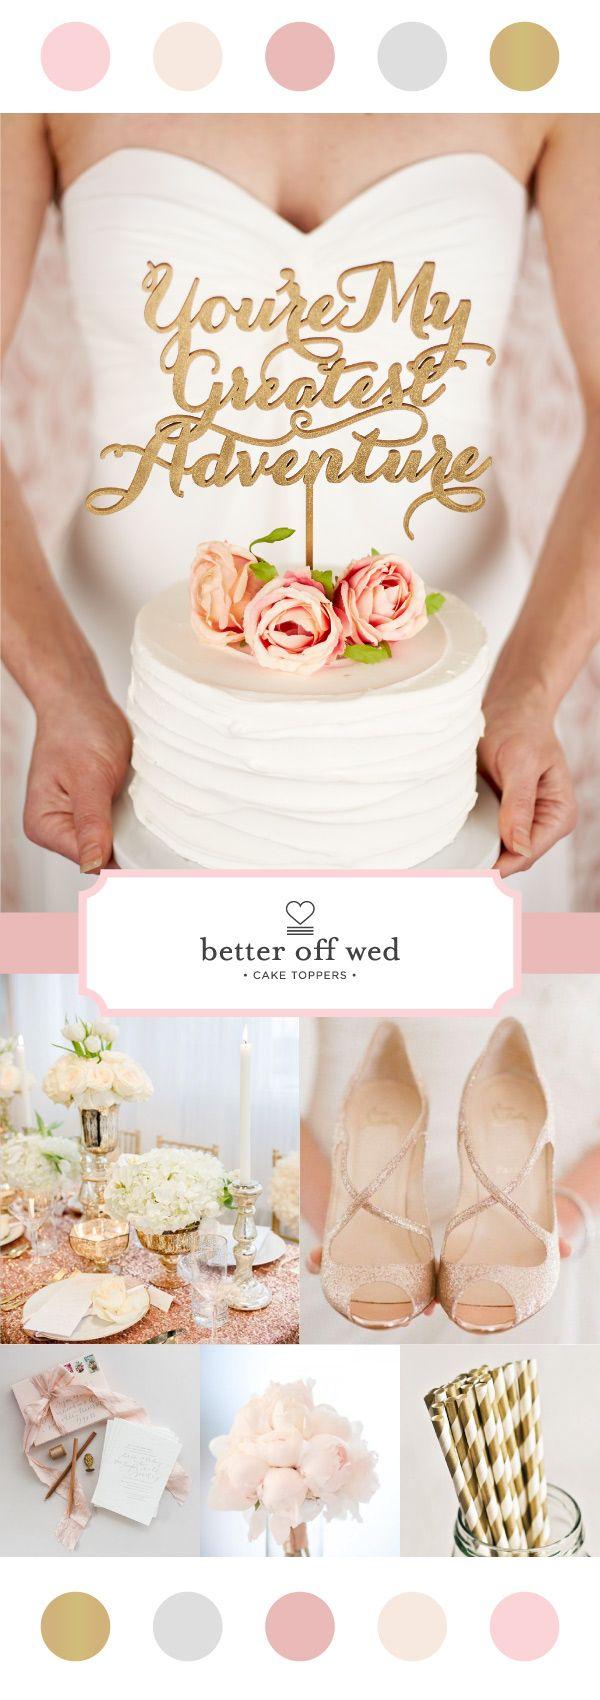 681 best future wedding craziness! images on Pinterest | Birthday ...